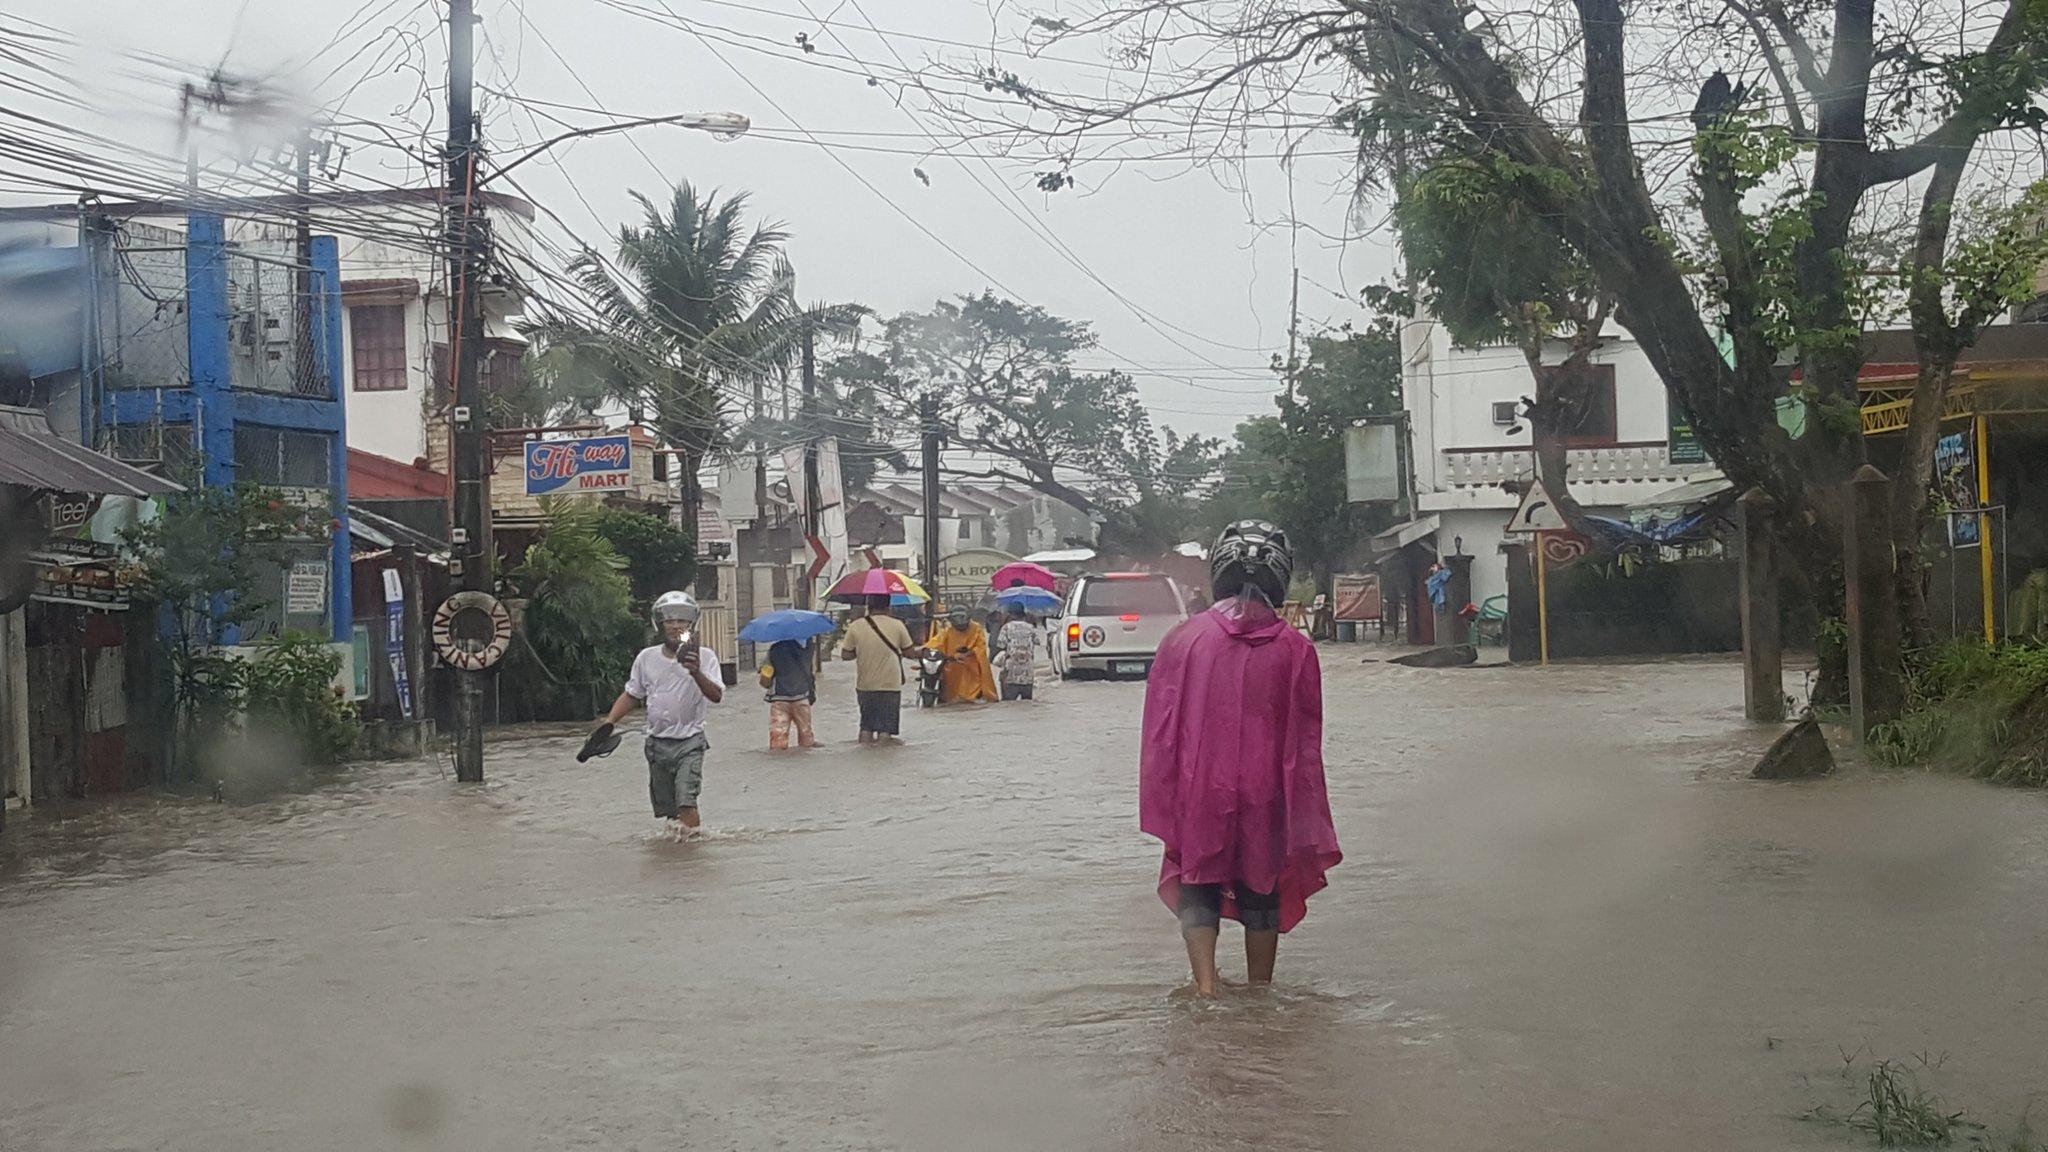 Sitwasyon ng baha sa may San Felipe Road, Naga City.  @ANCALERTS @ABSCBNNews @DZMMTeleRadyo https://t.co/gZZc7OSWNj